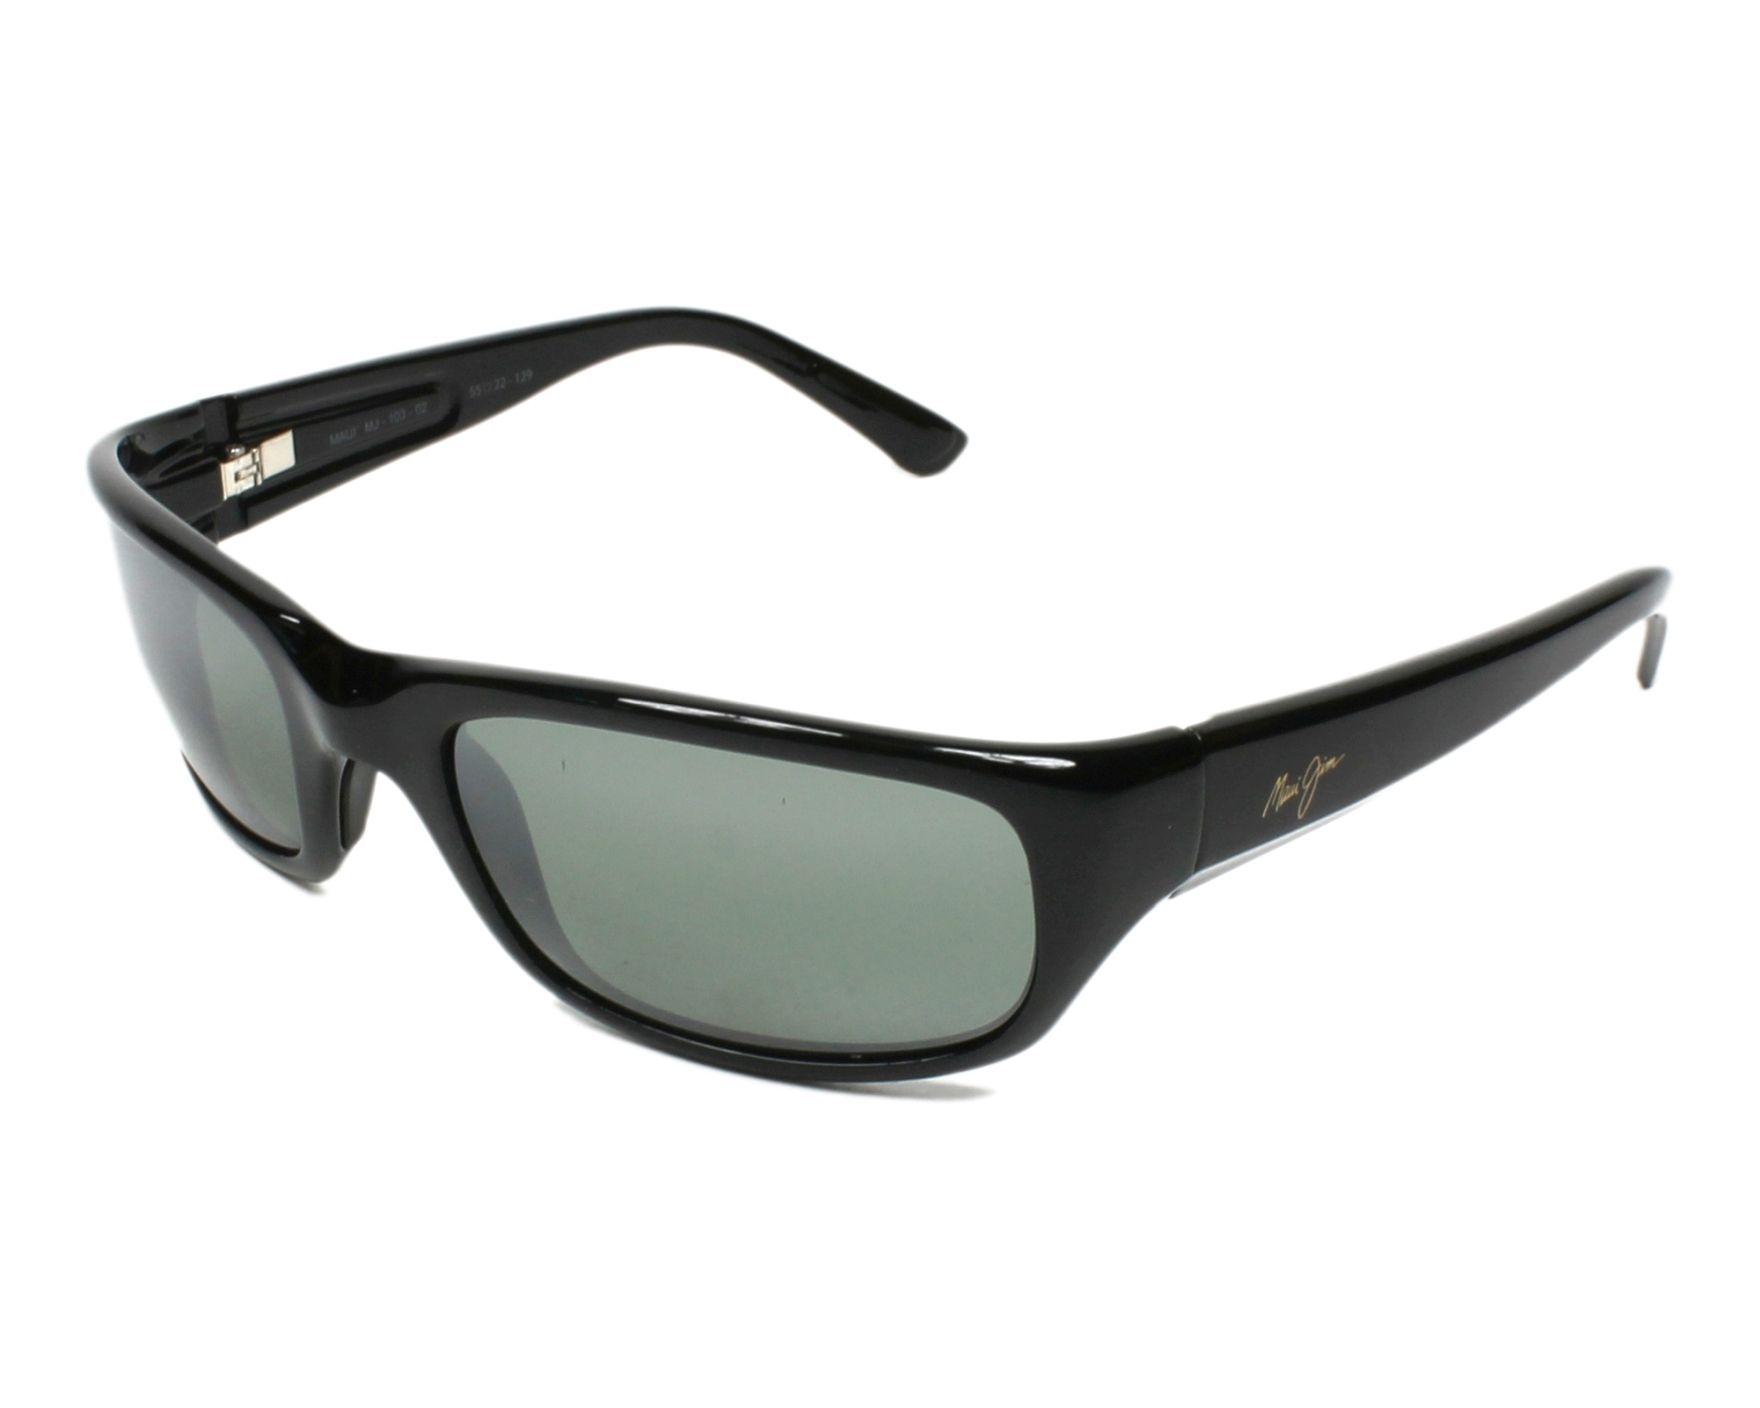 f69bde0ffec Sunglasses Maui Jim 103 02 55-22 Black profile view